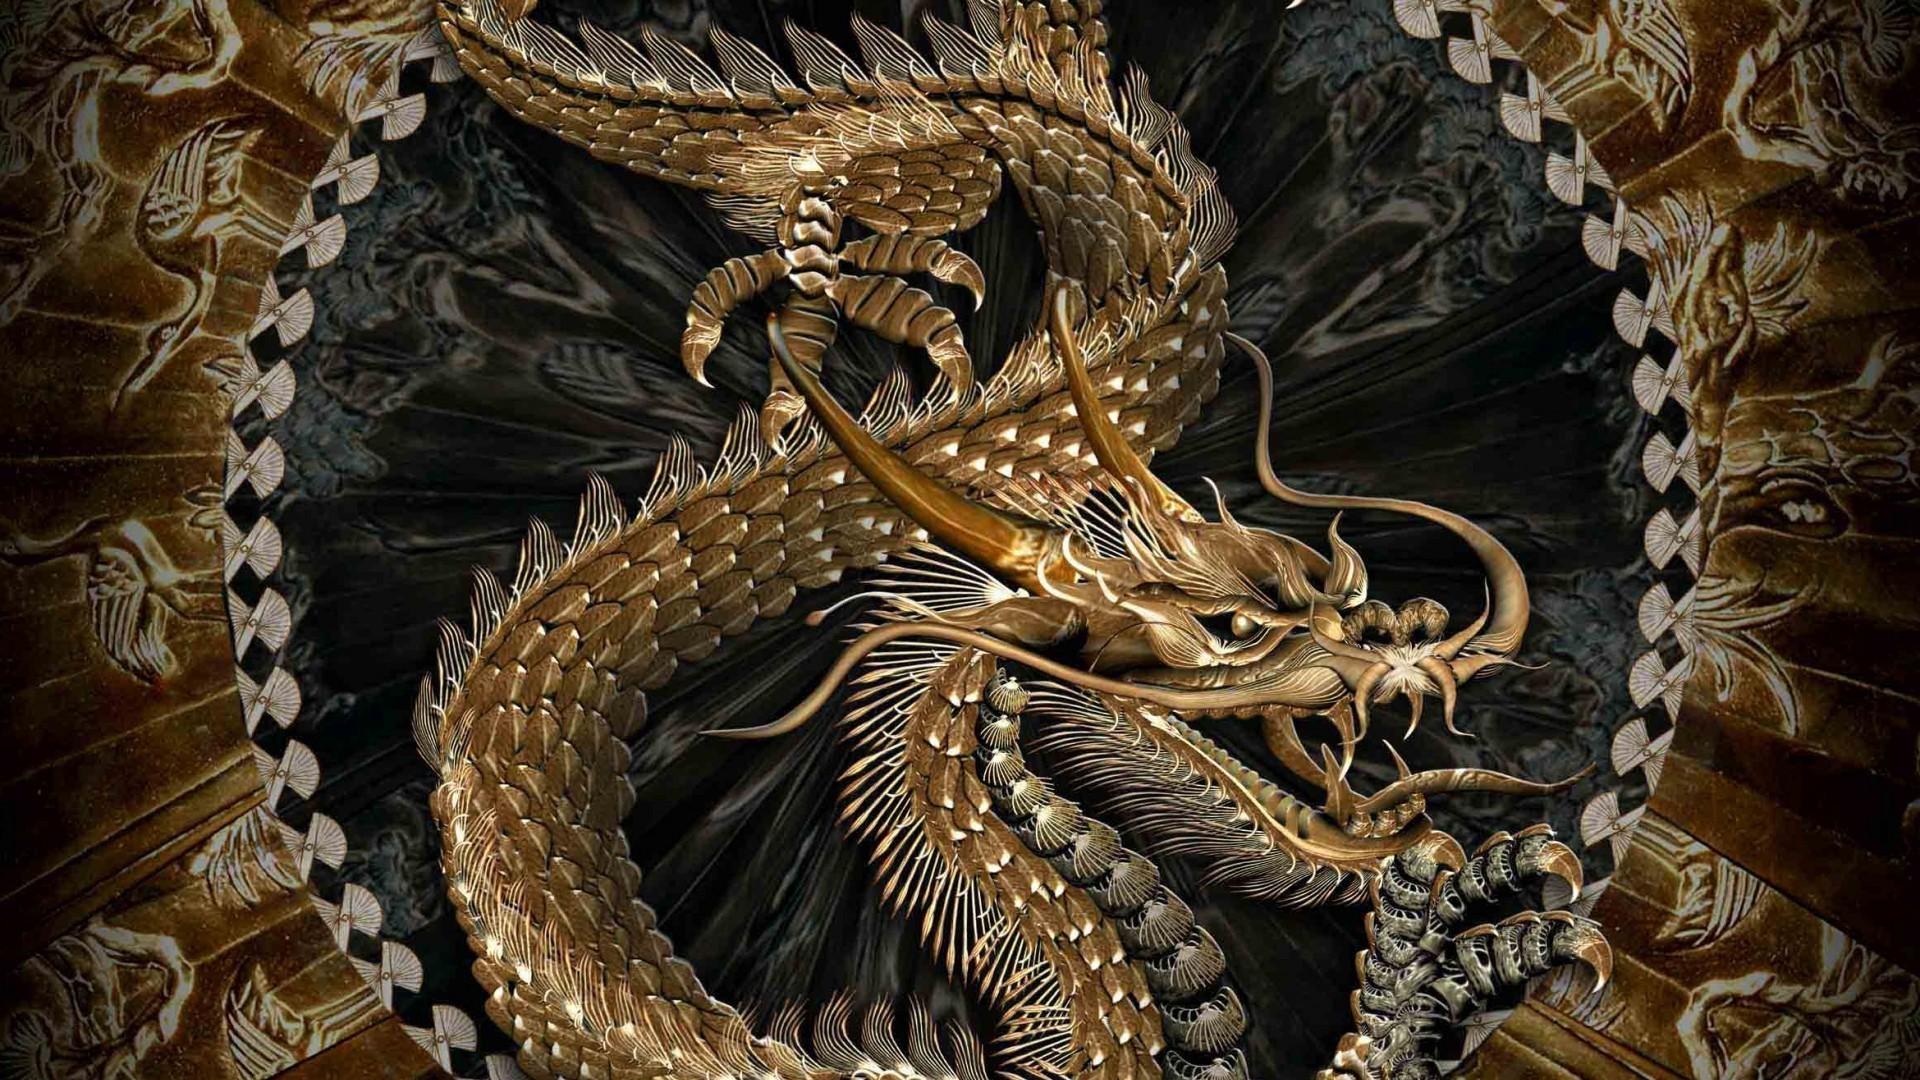 Cool Dragon Wallpaper (54+ Images